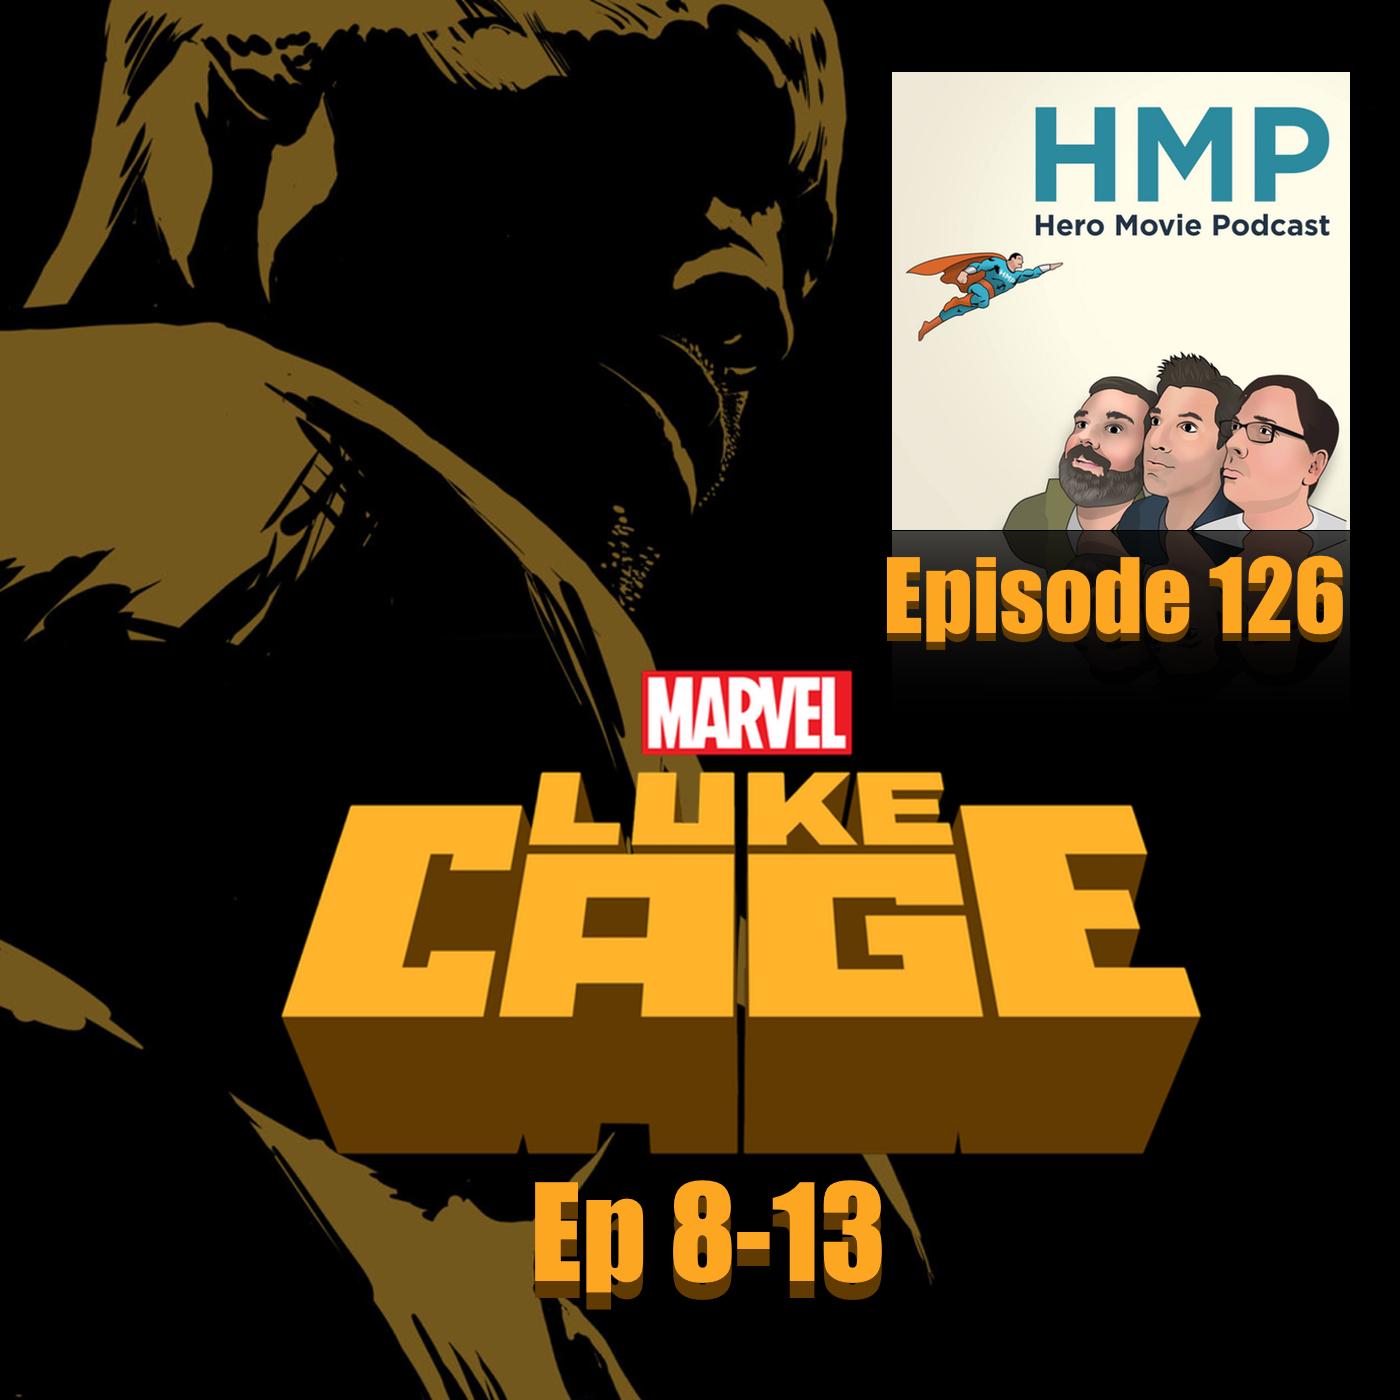 Episode 126- Luke Cage Season 1, Ep 8-13